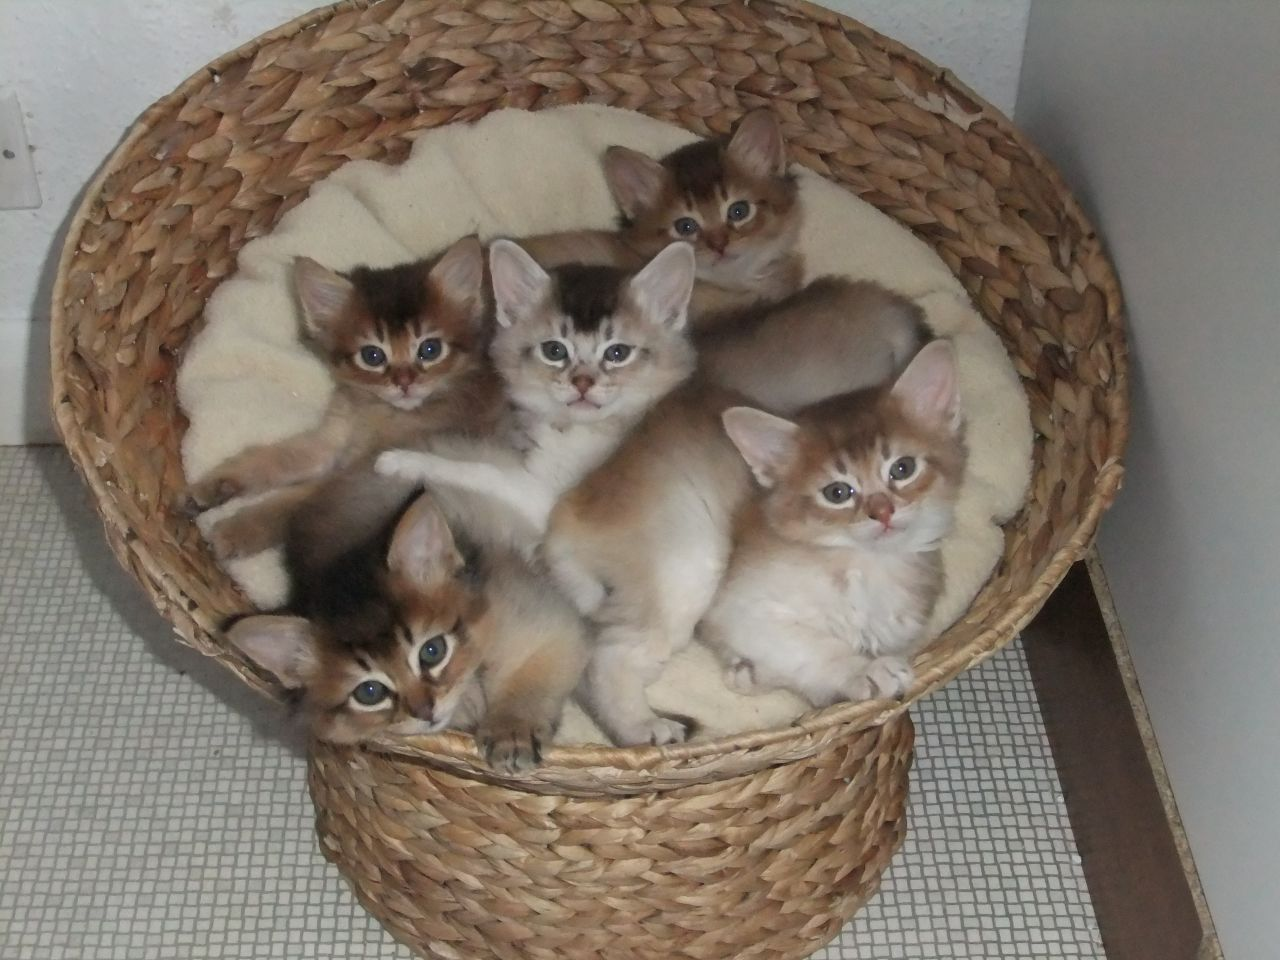 Somali Kitten: Somali Very Cute Somali Kitten Pictures And S Breed